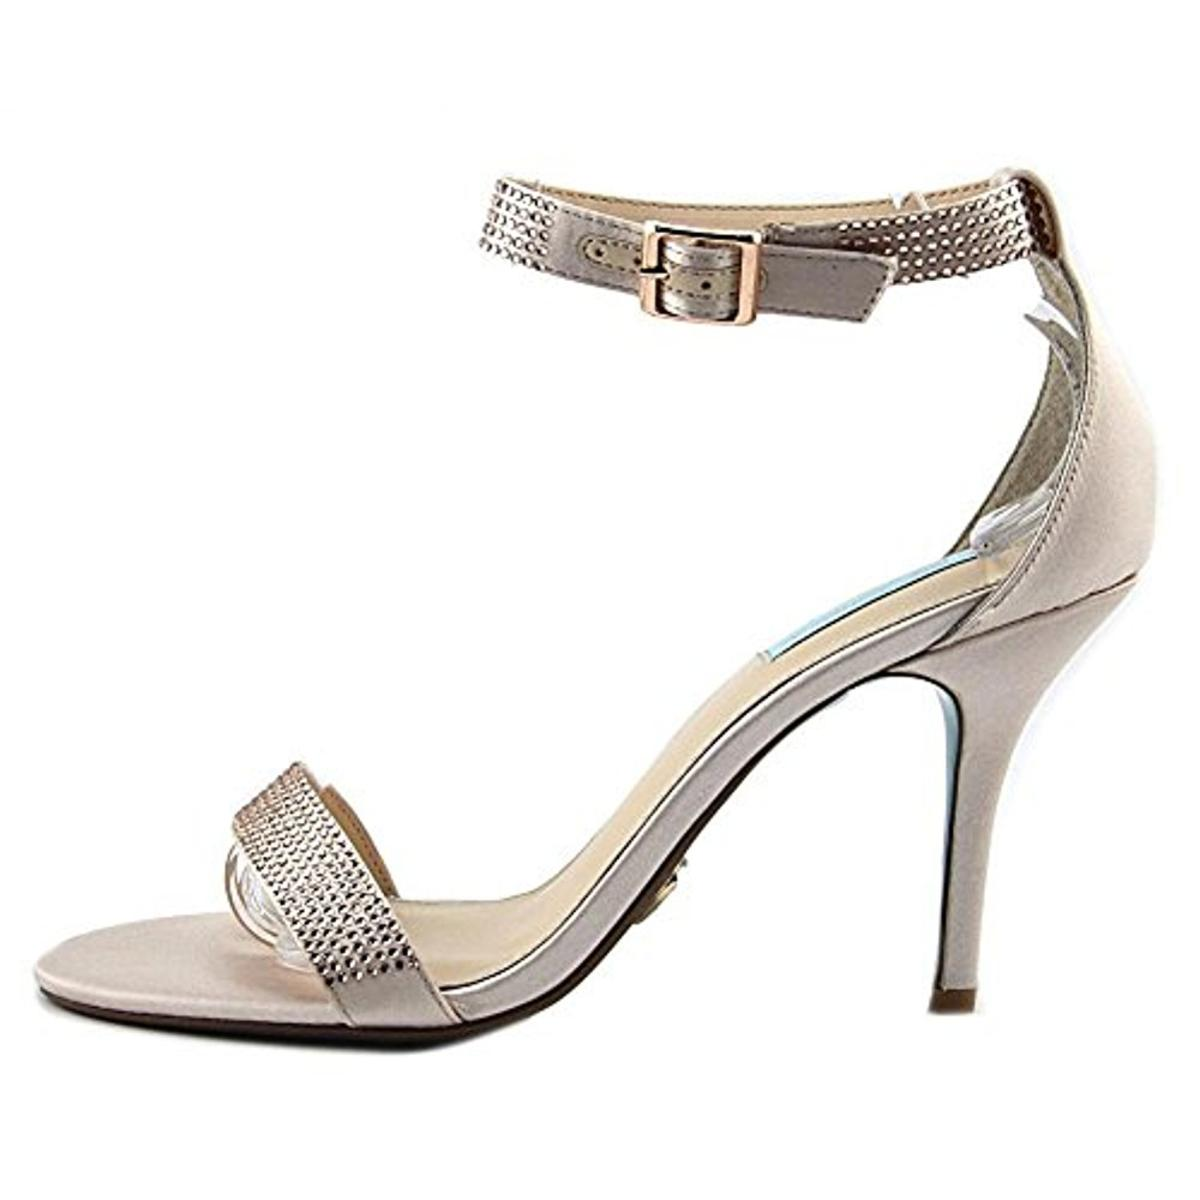 Blue-by-Betsey-Johnson-Womens-Shilo-Studded-Heels-Dress-Sandals-Shoes-BHFO-0493 thumbnail 9